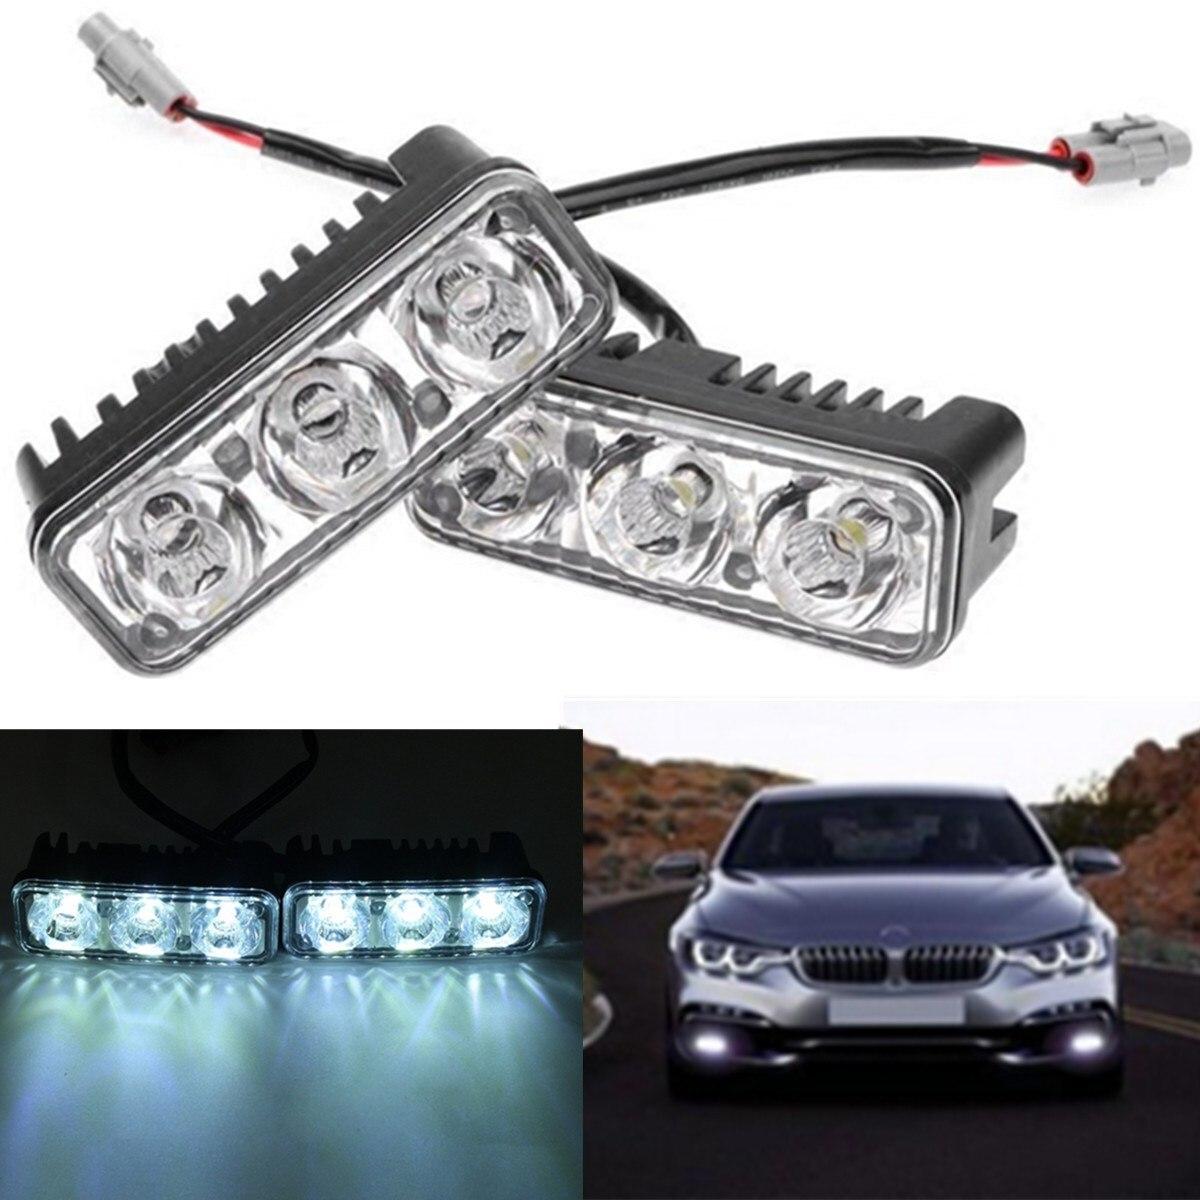 2x 16W 12V LED Daytime Running Light Car Light Bar Fog Lamp  For Car Indicator Motorcycle Driving Offroad Tractor Truck SUV ATV стоимость